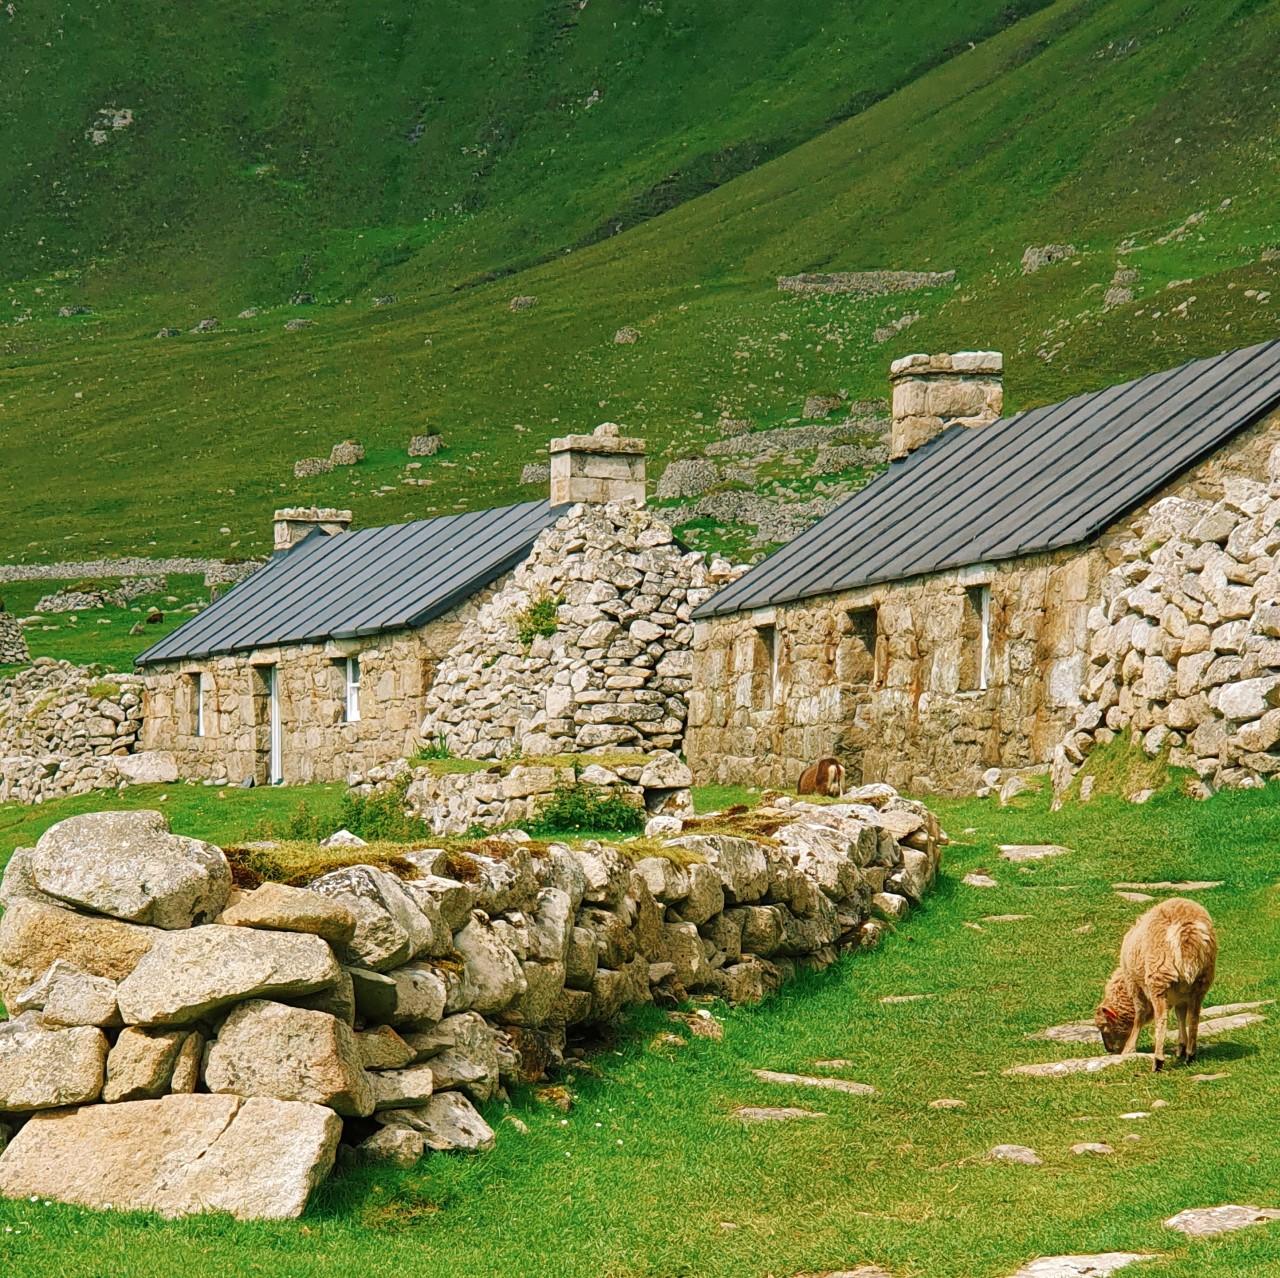 st kilda village and sheep.jpg